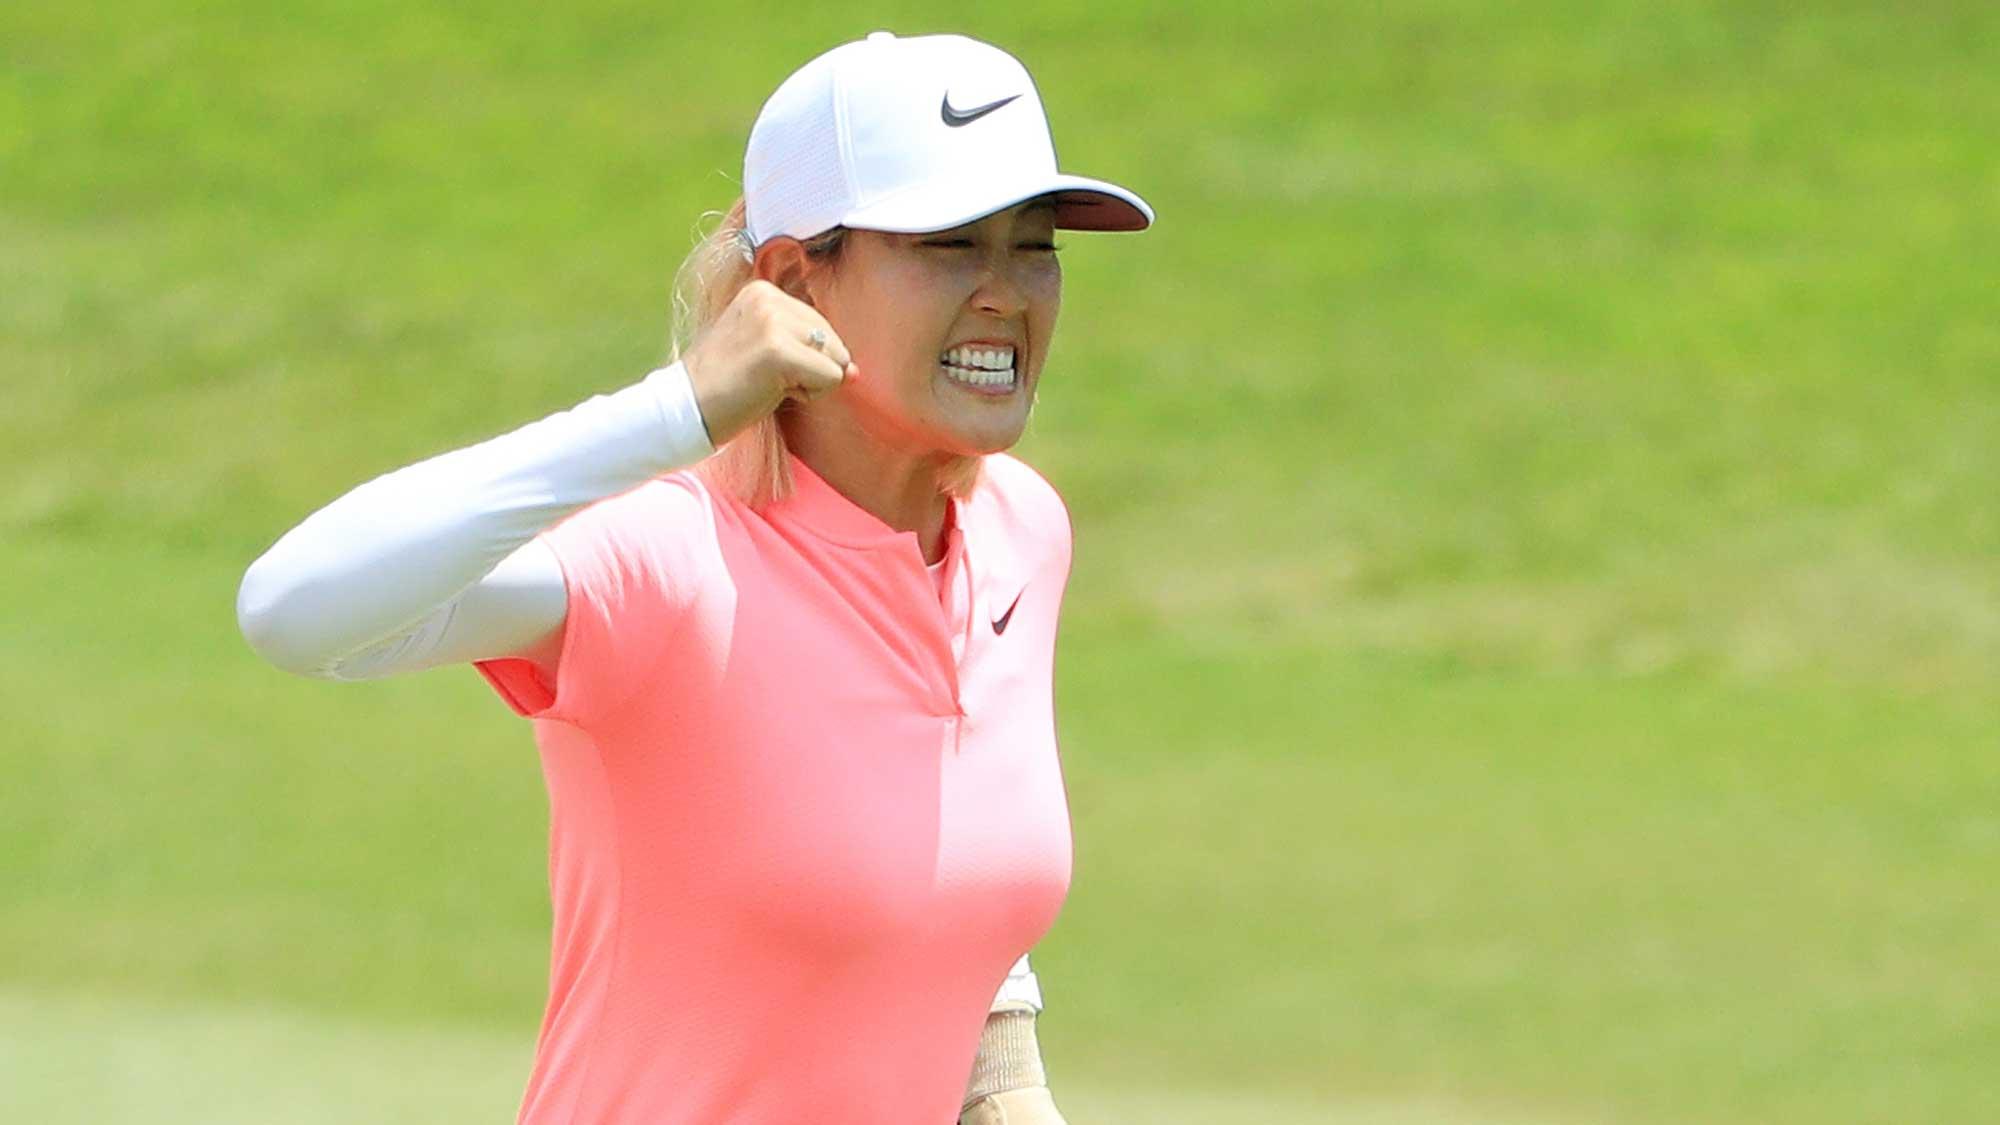 Michelle Wie 1 LPGA major